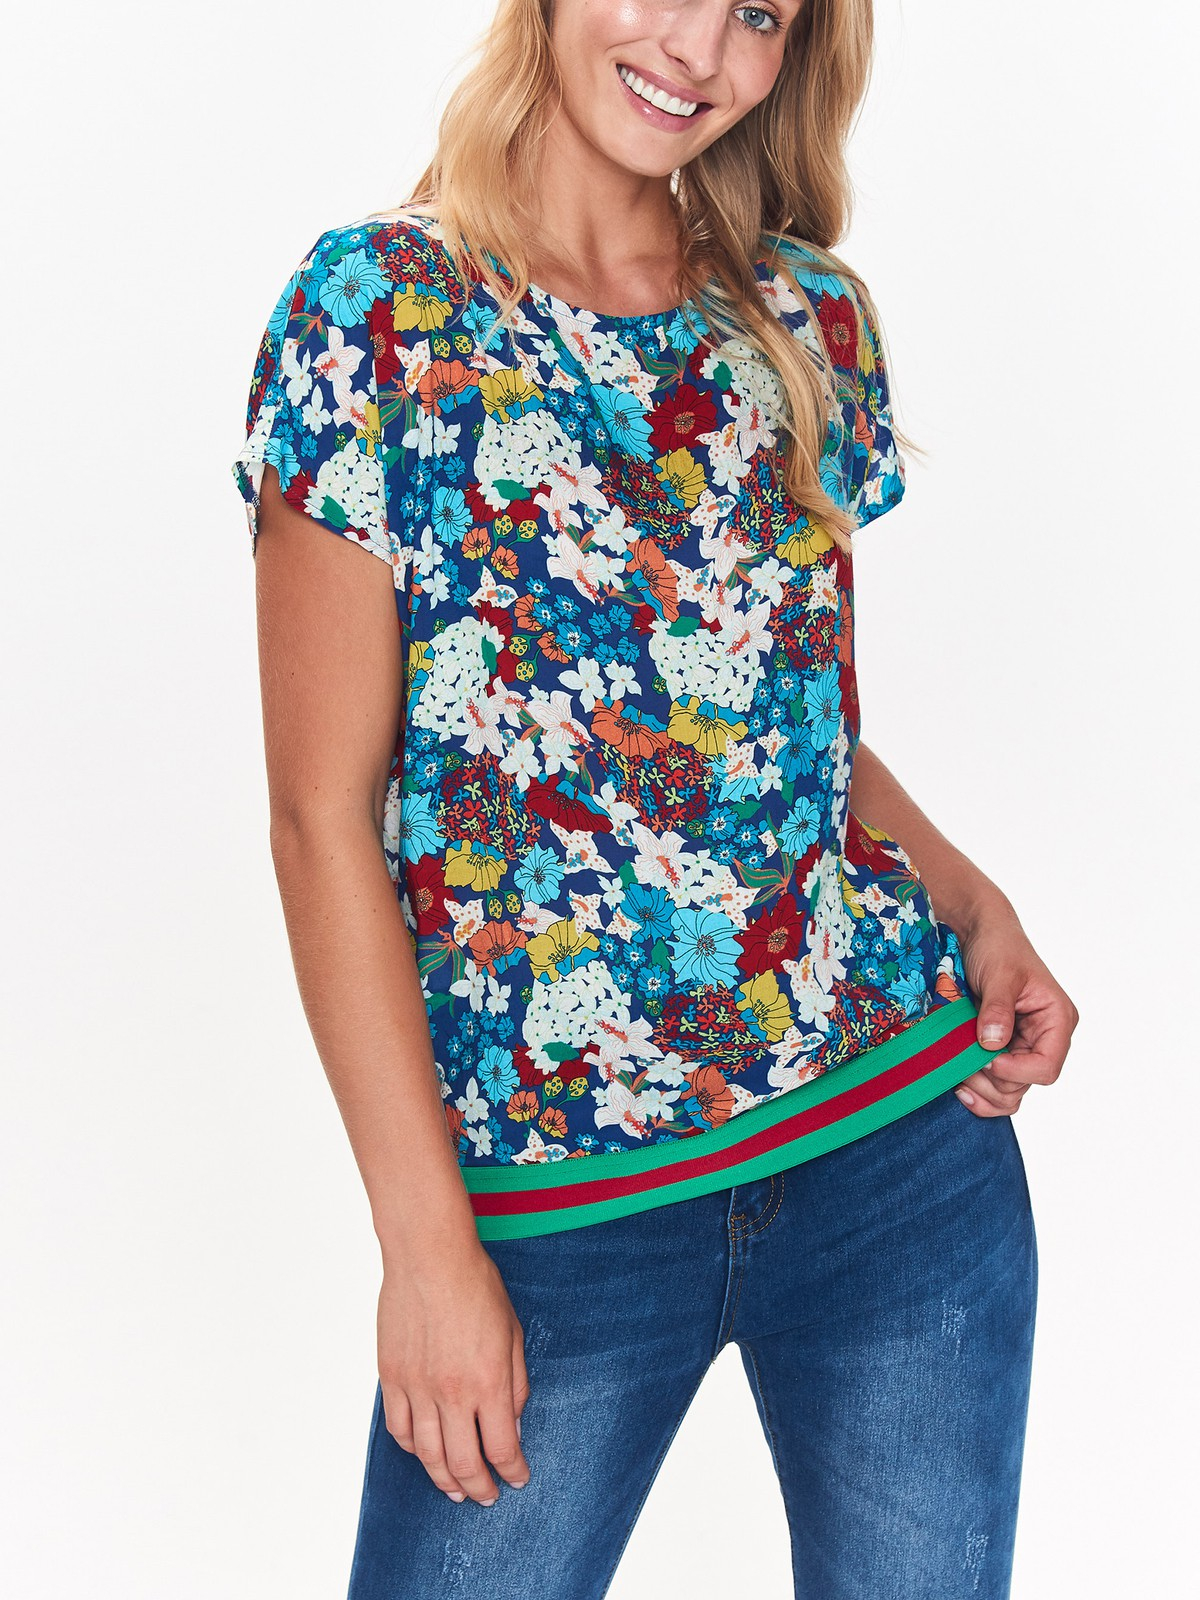 top secret γυναικειο φλοραλ t-shirt - 249152